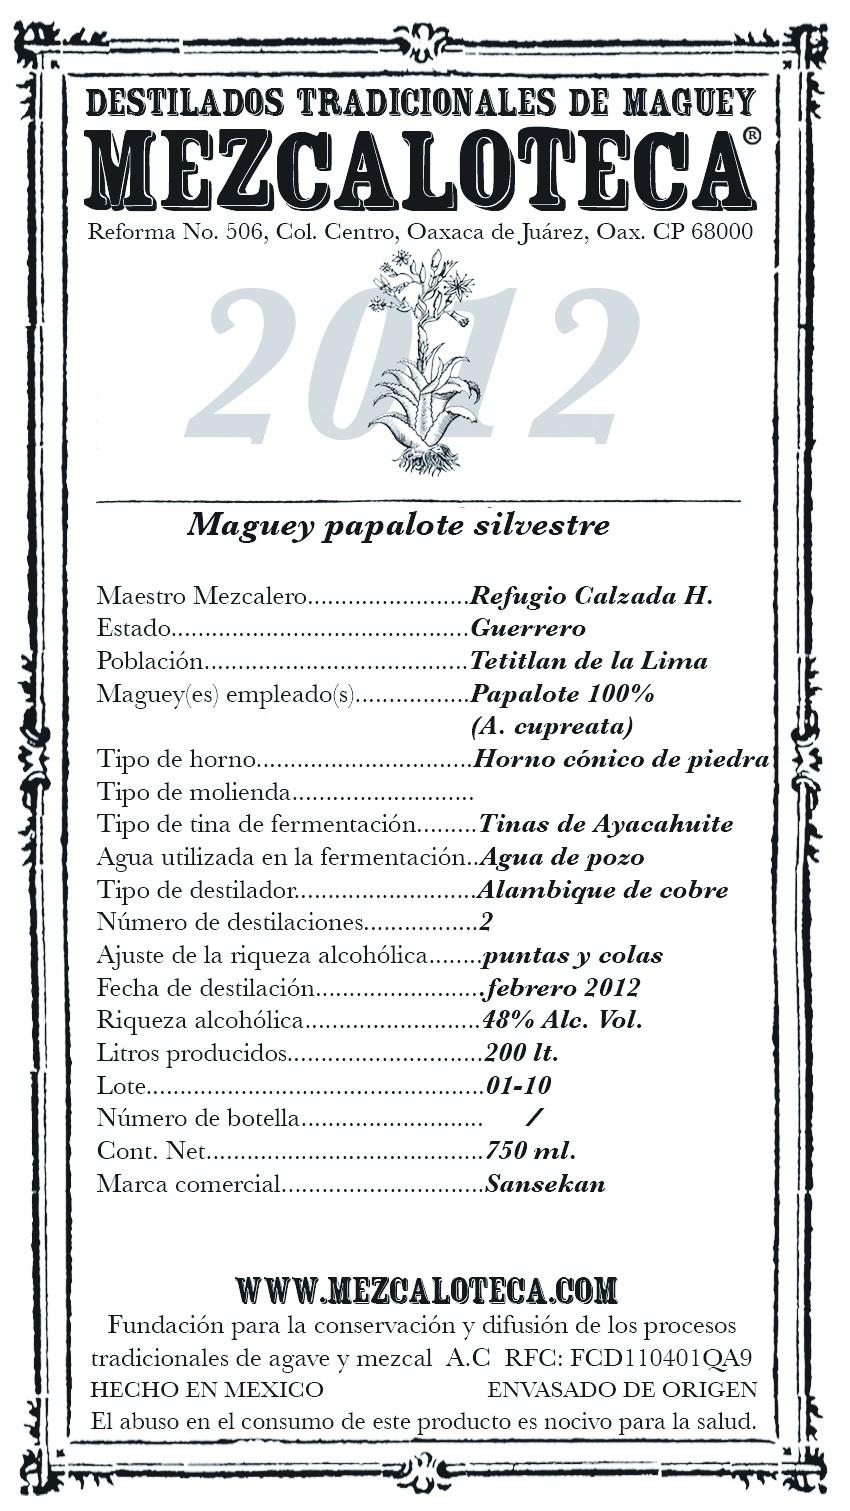 papalote.sansekan.RC.2012.750[1]_1 web.jpg